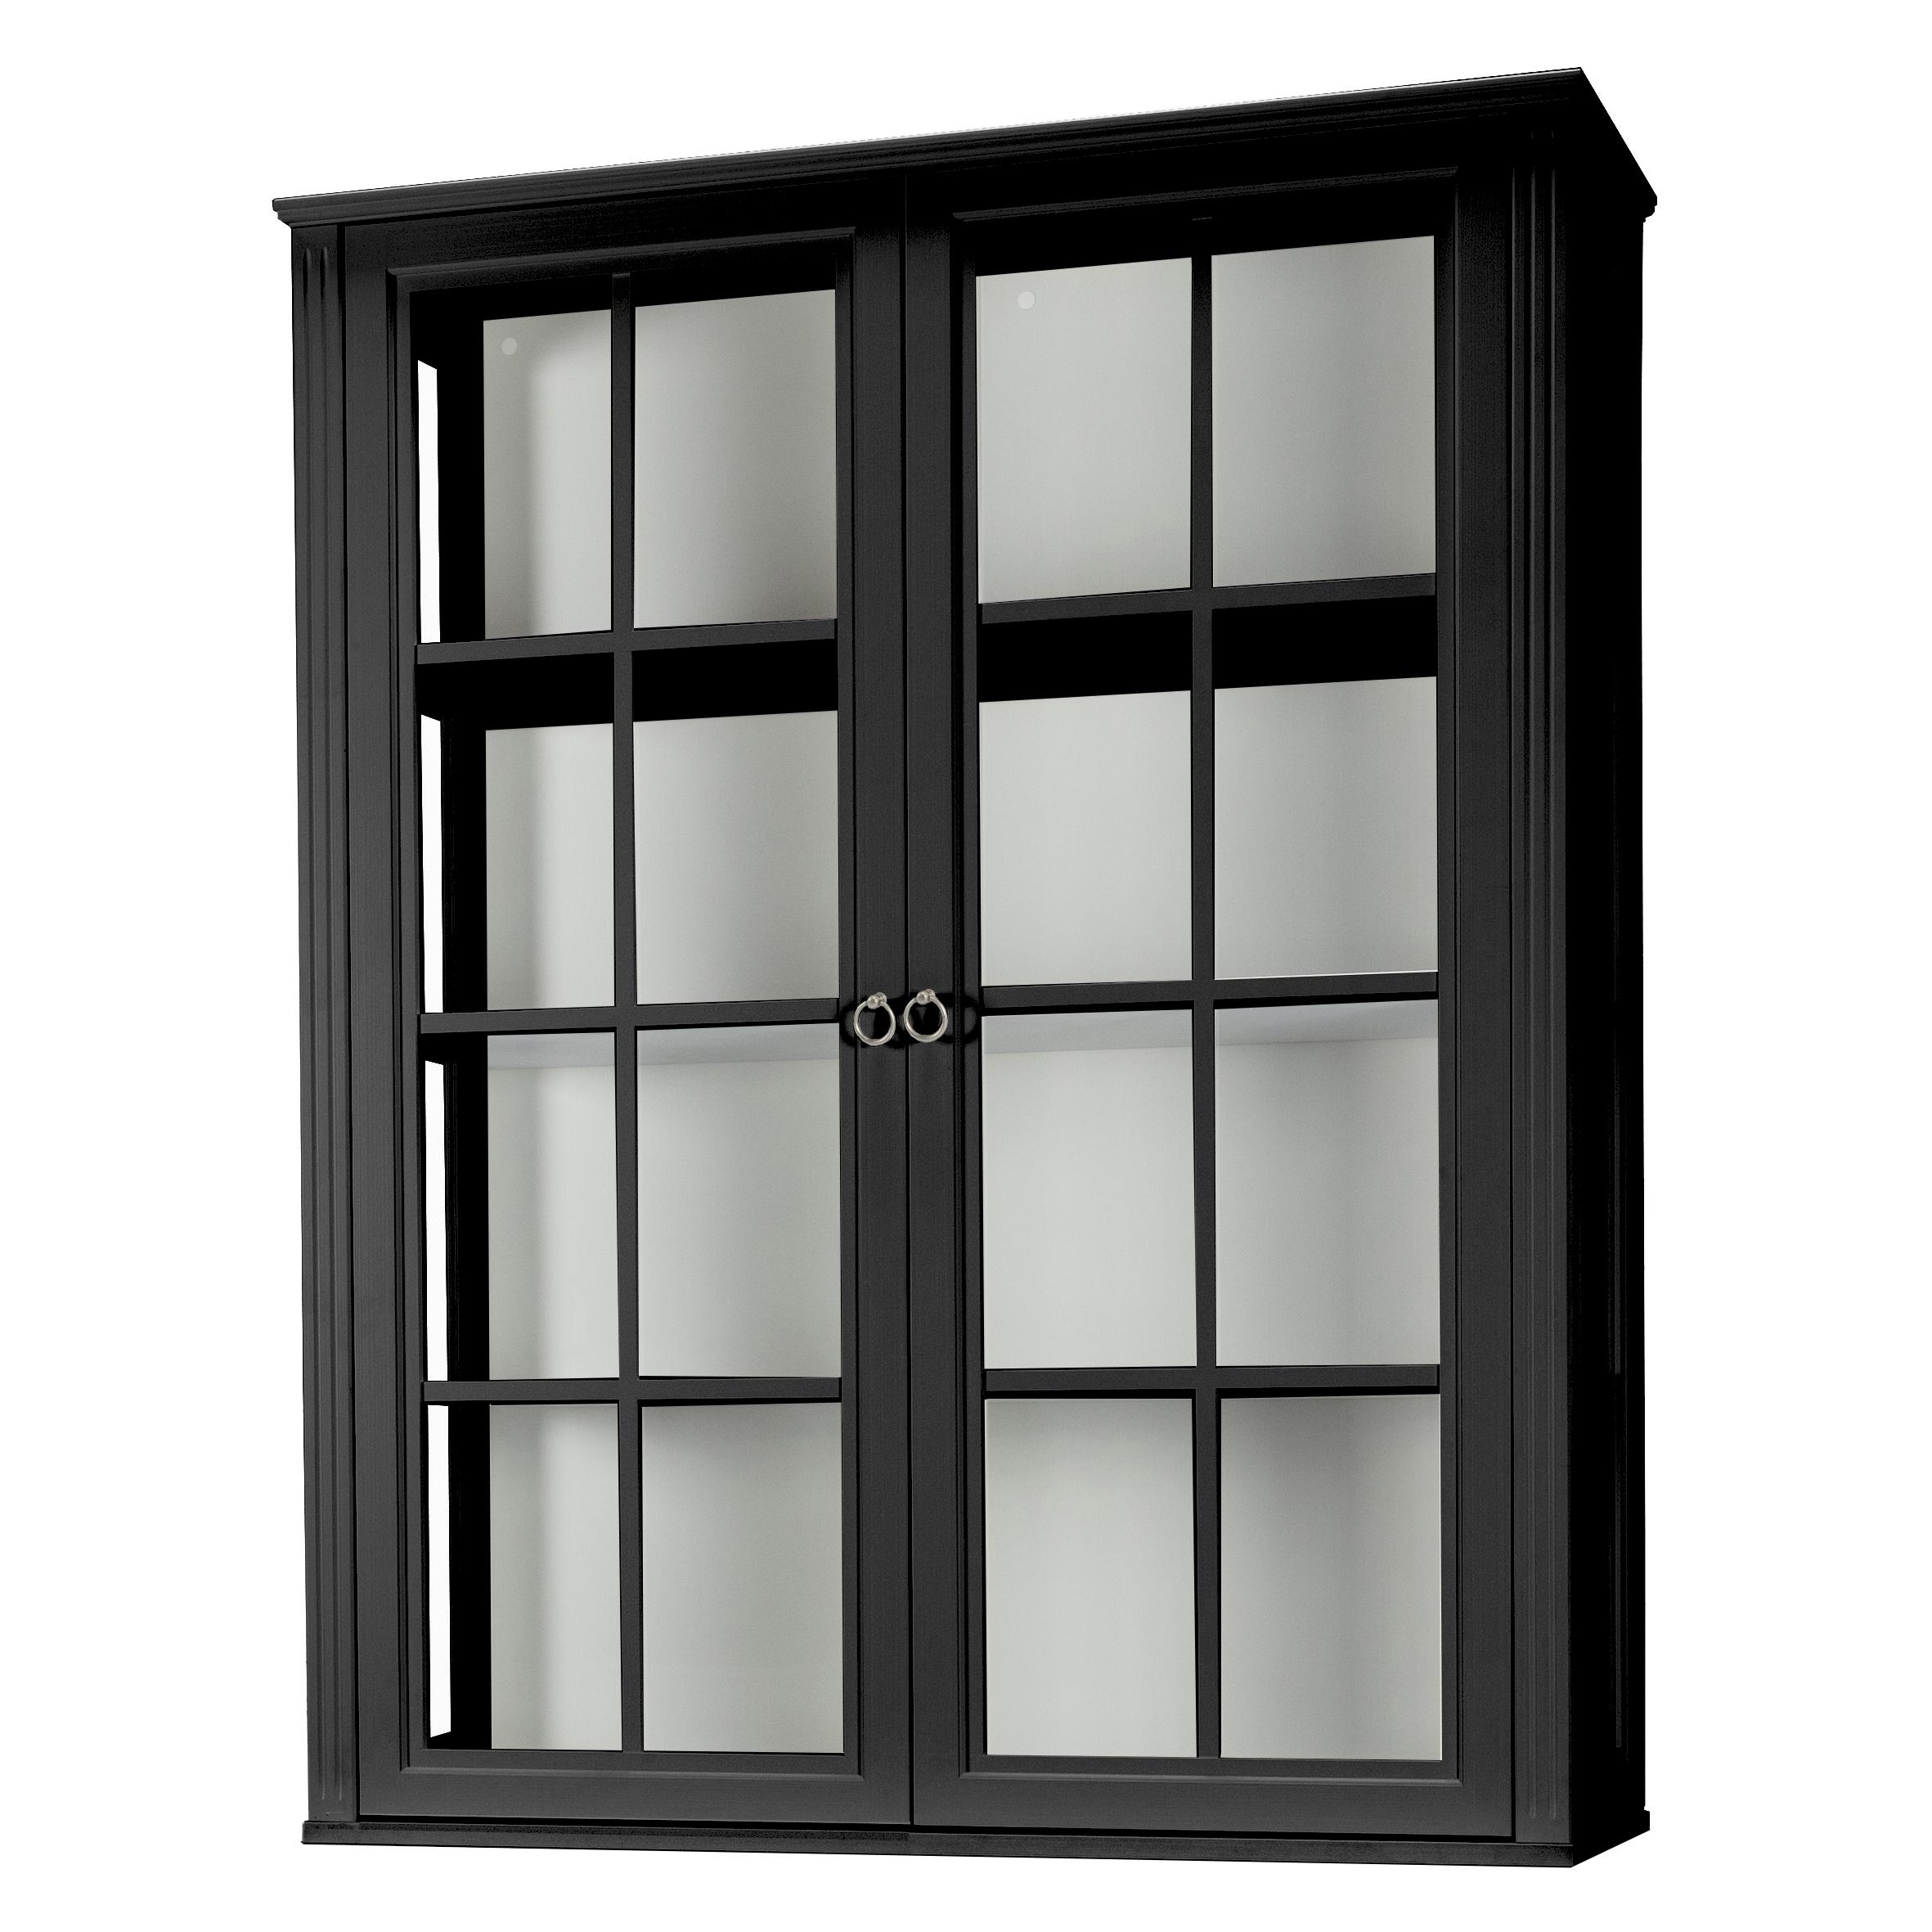 Stockholm 2.0 Vitrin glassidor 2 vitrindörrar